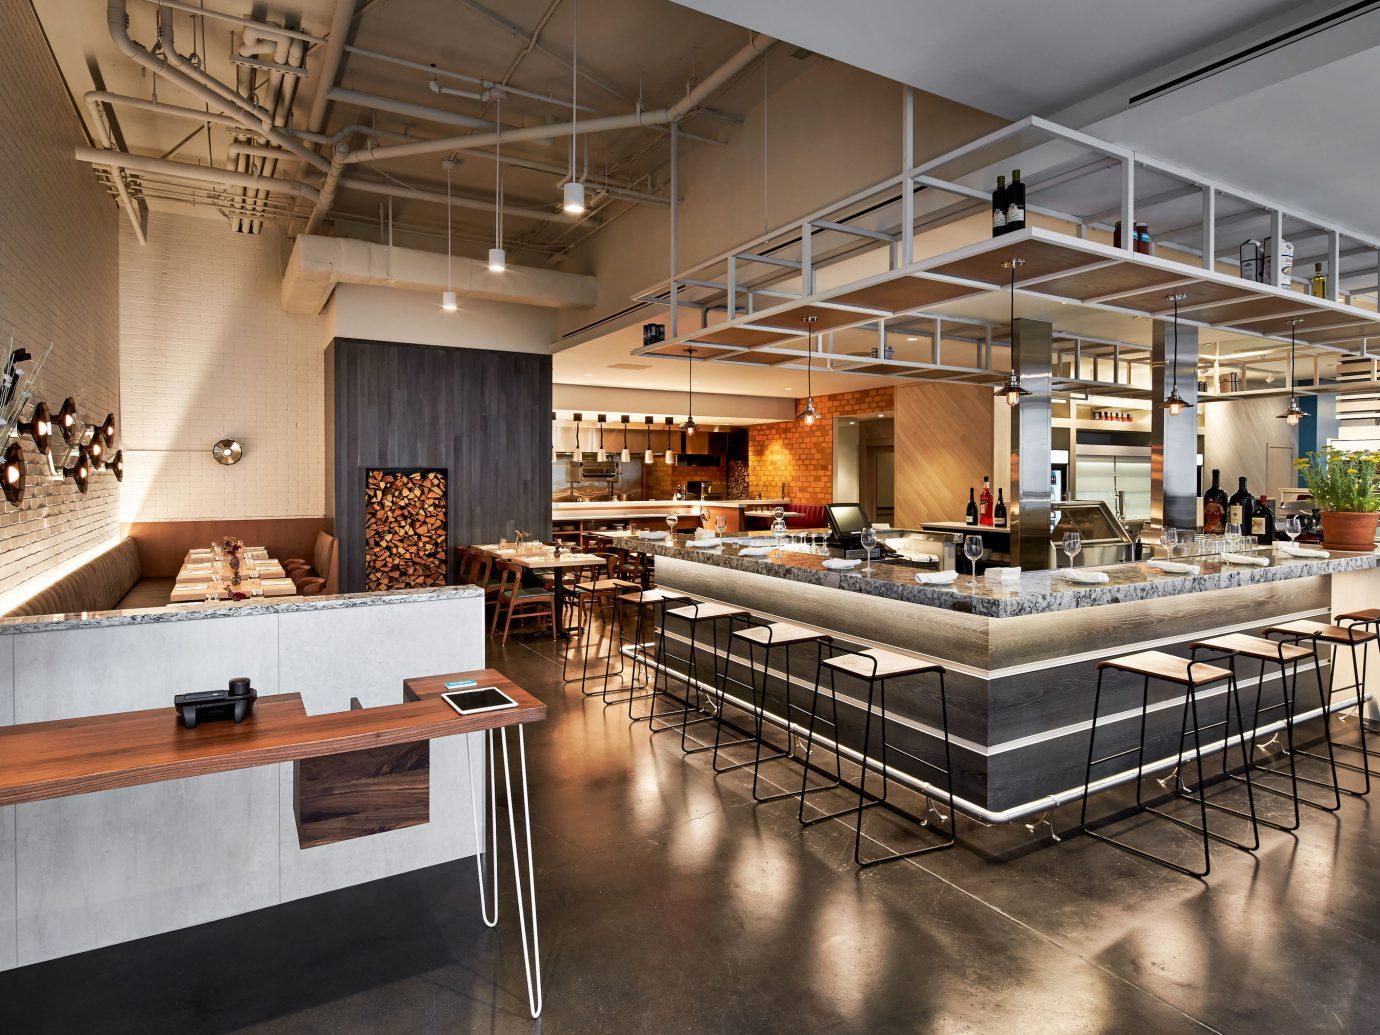 Food + Drink indoor floor ceiling interior design Kitchen countertop loft interior designer several